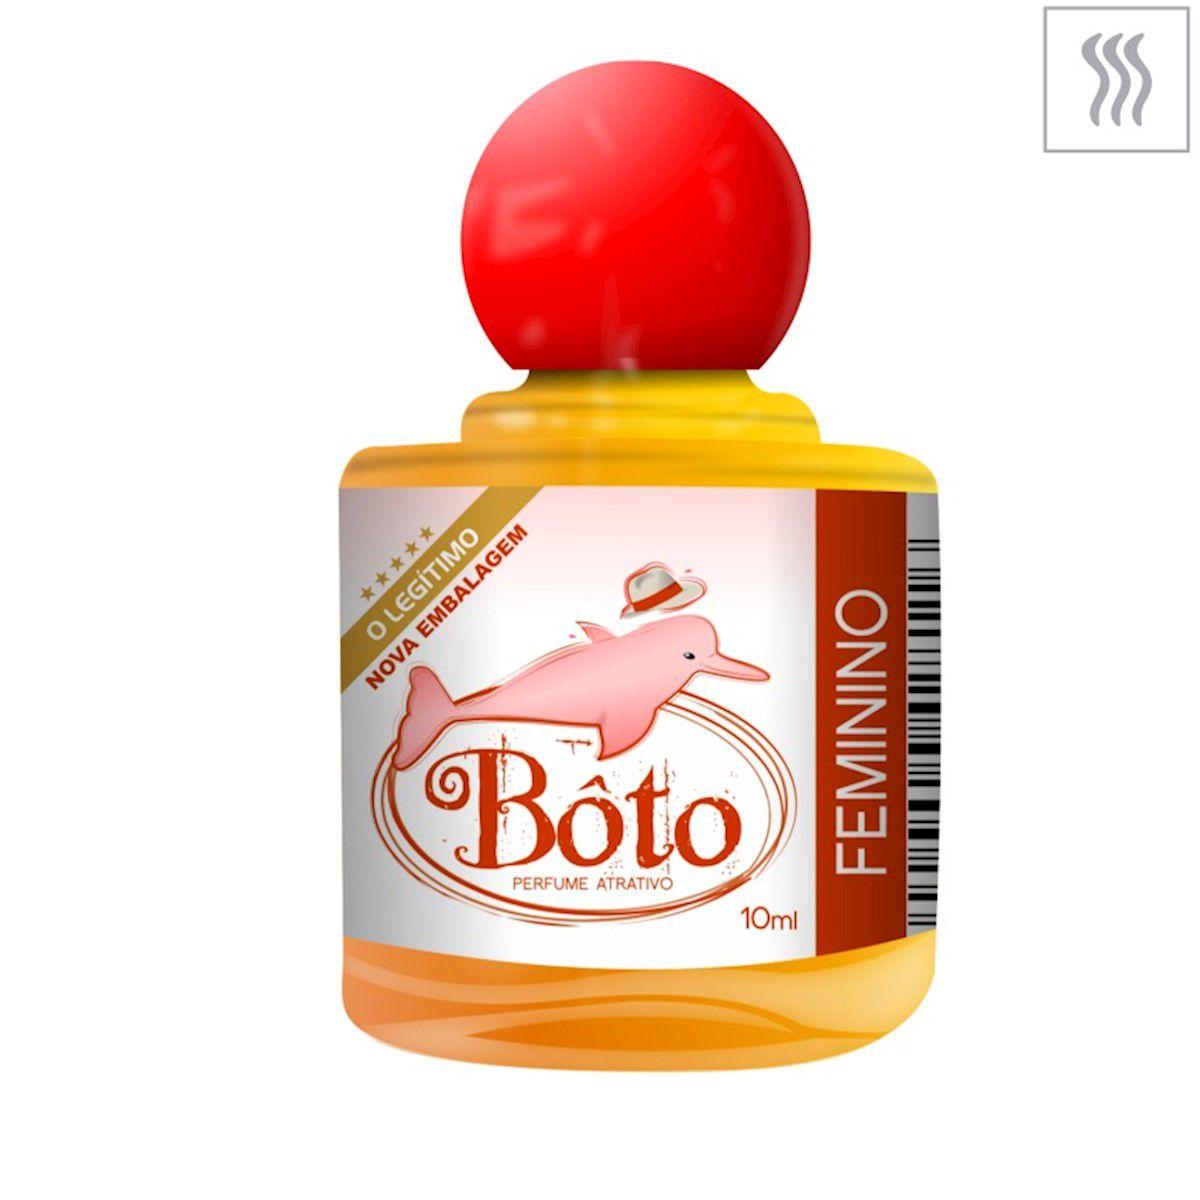 Perfume Afrodisíaco Feminino Bôto Concentrado 10ml